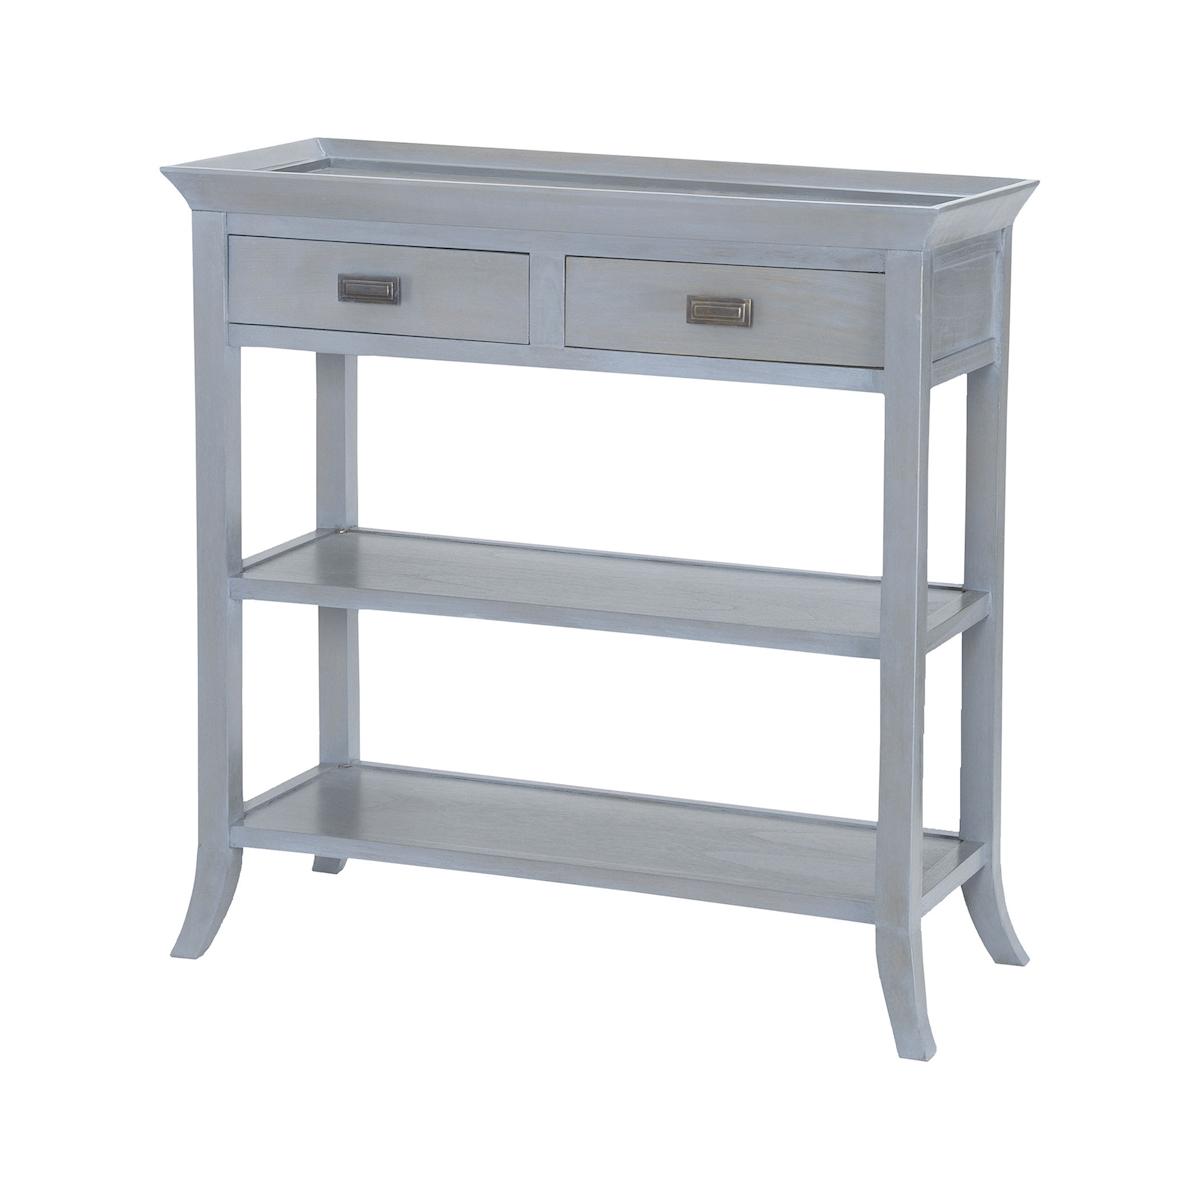 Tamara Console Table in Gravesend Grey | Elk Home